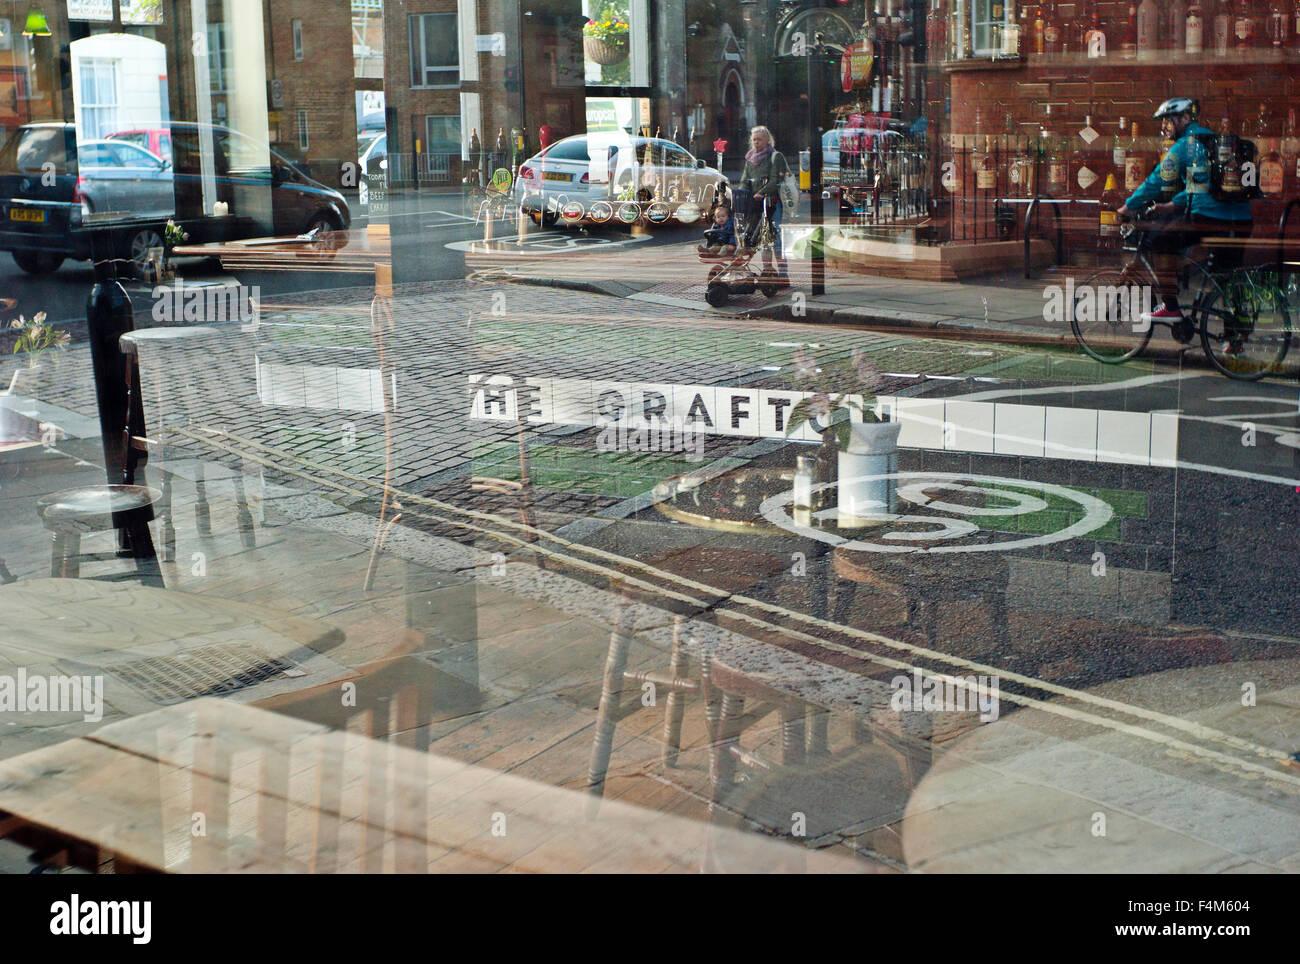 reflection of street scene in window of The Grafton Pub Kentish Town London UK - Stock Image